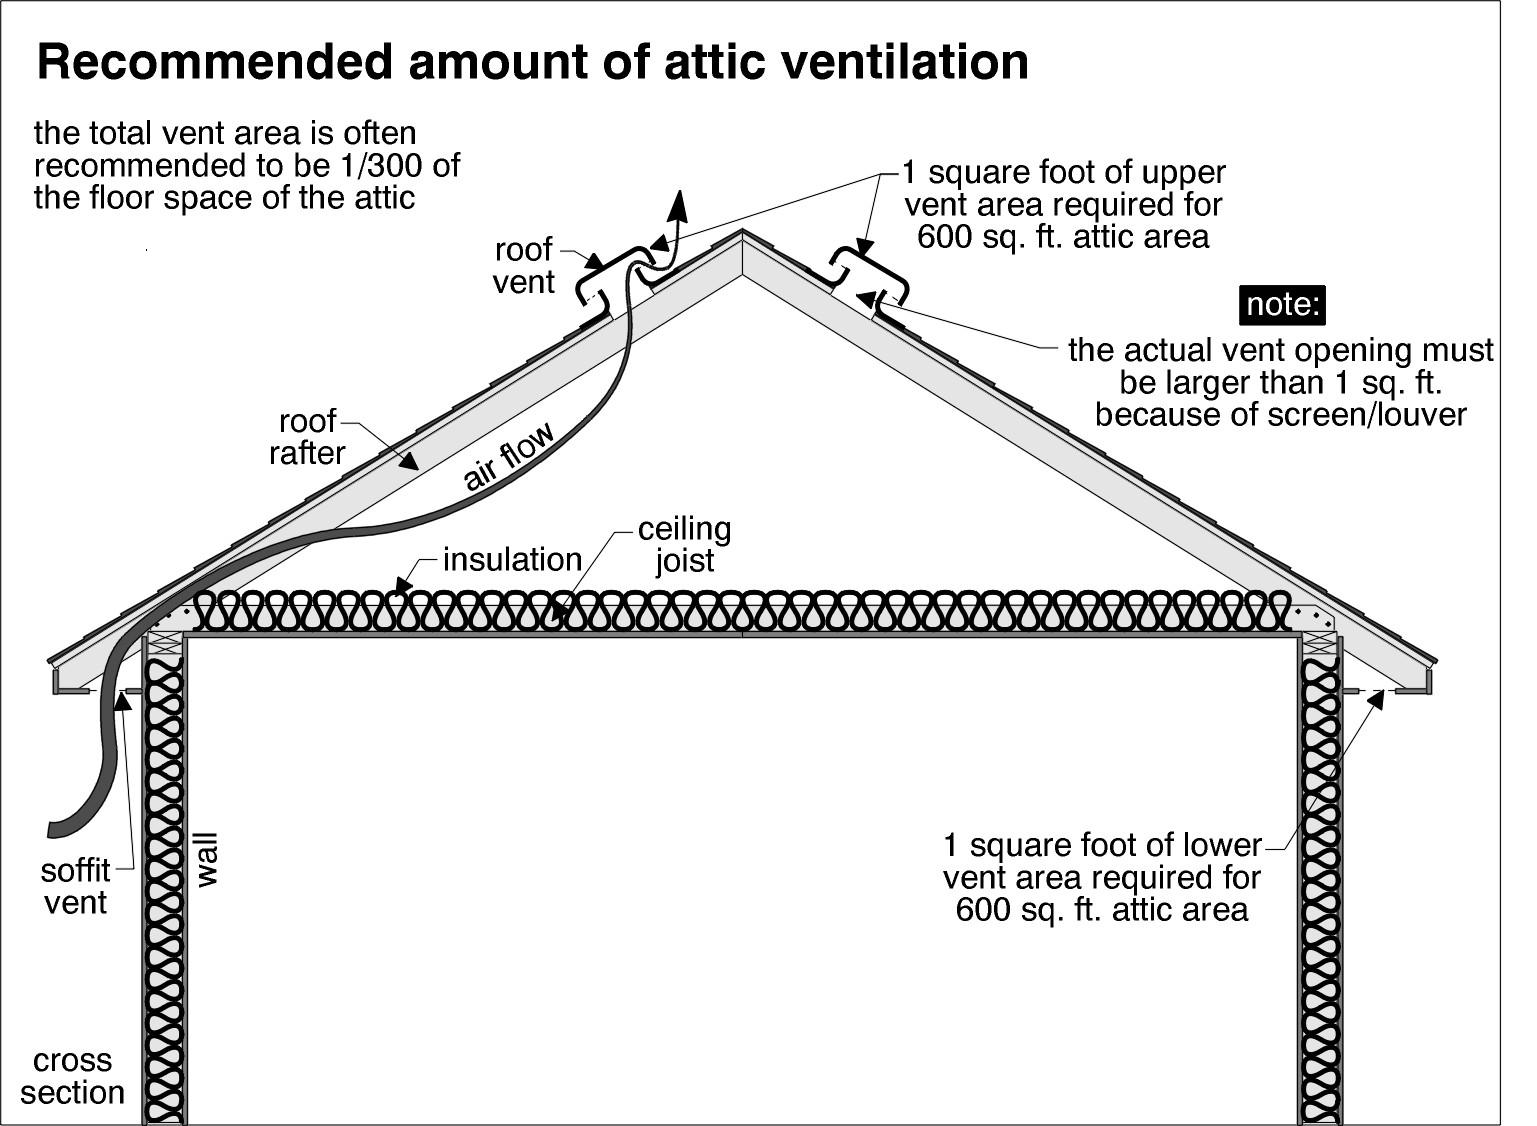 attic plumbing diagram star delta wiring ventilation contractor northern va md dc fairfax